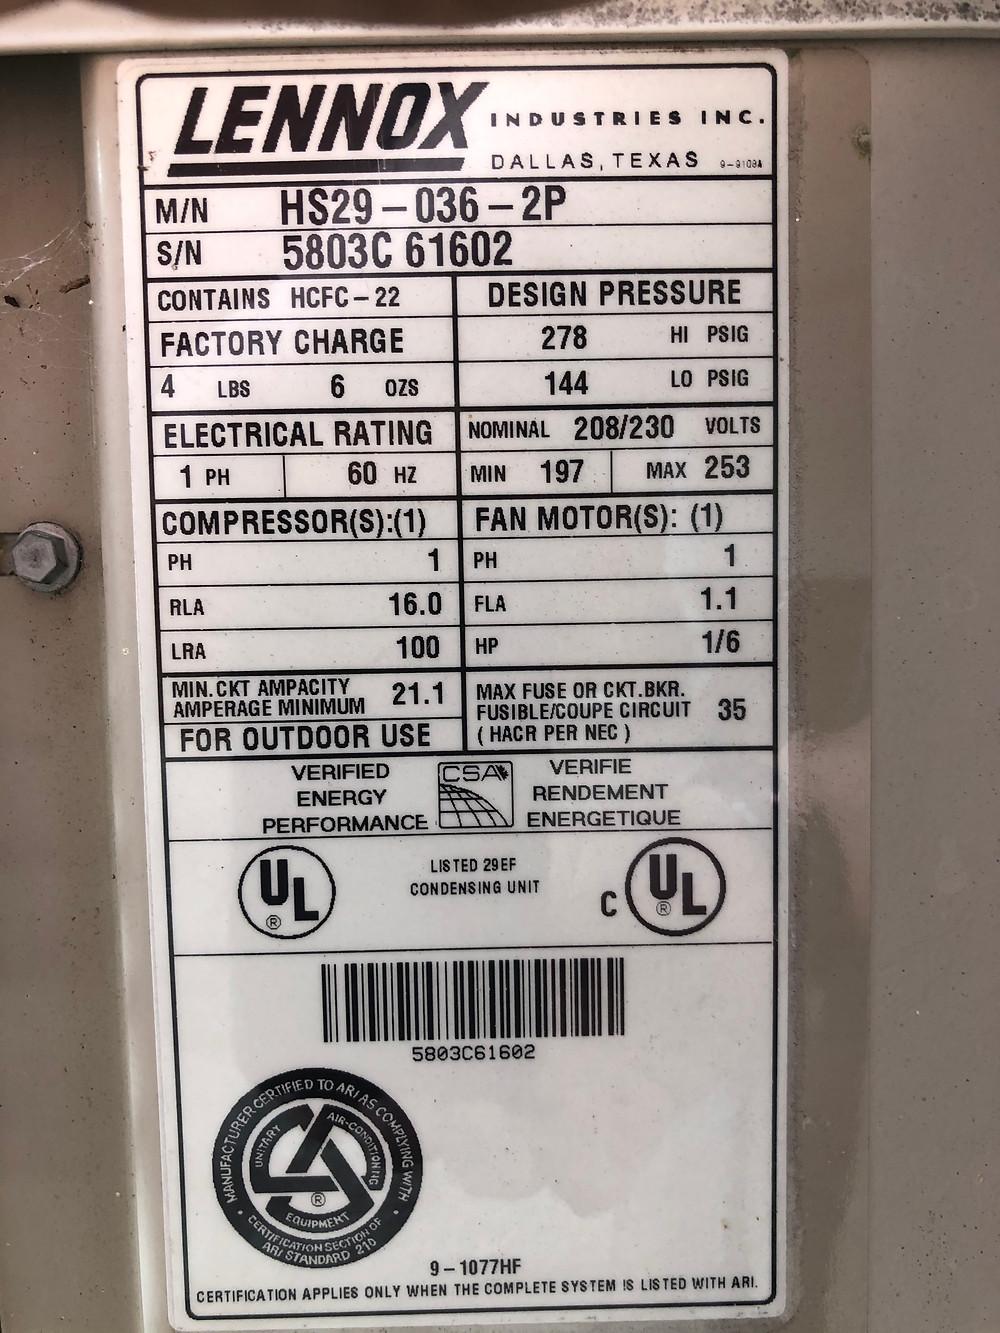 AC label, HVAC inspection